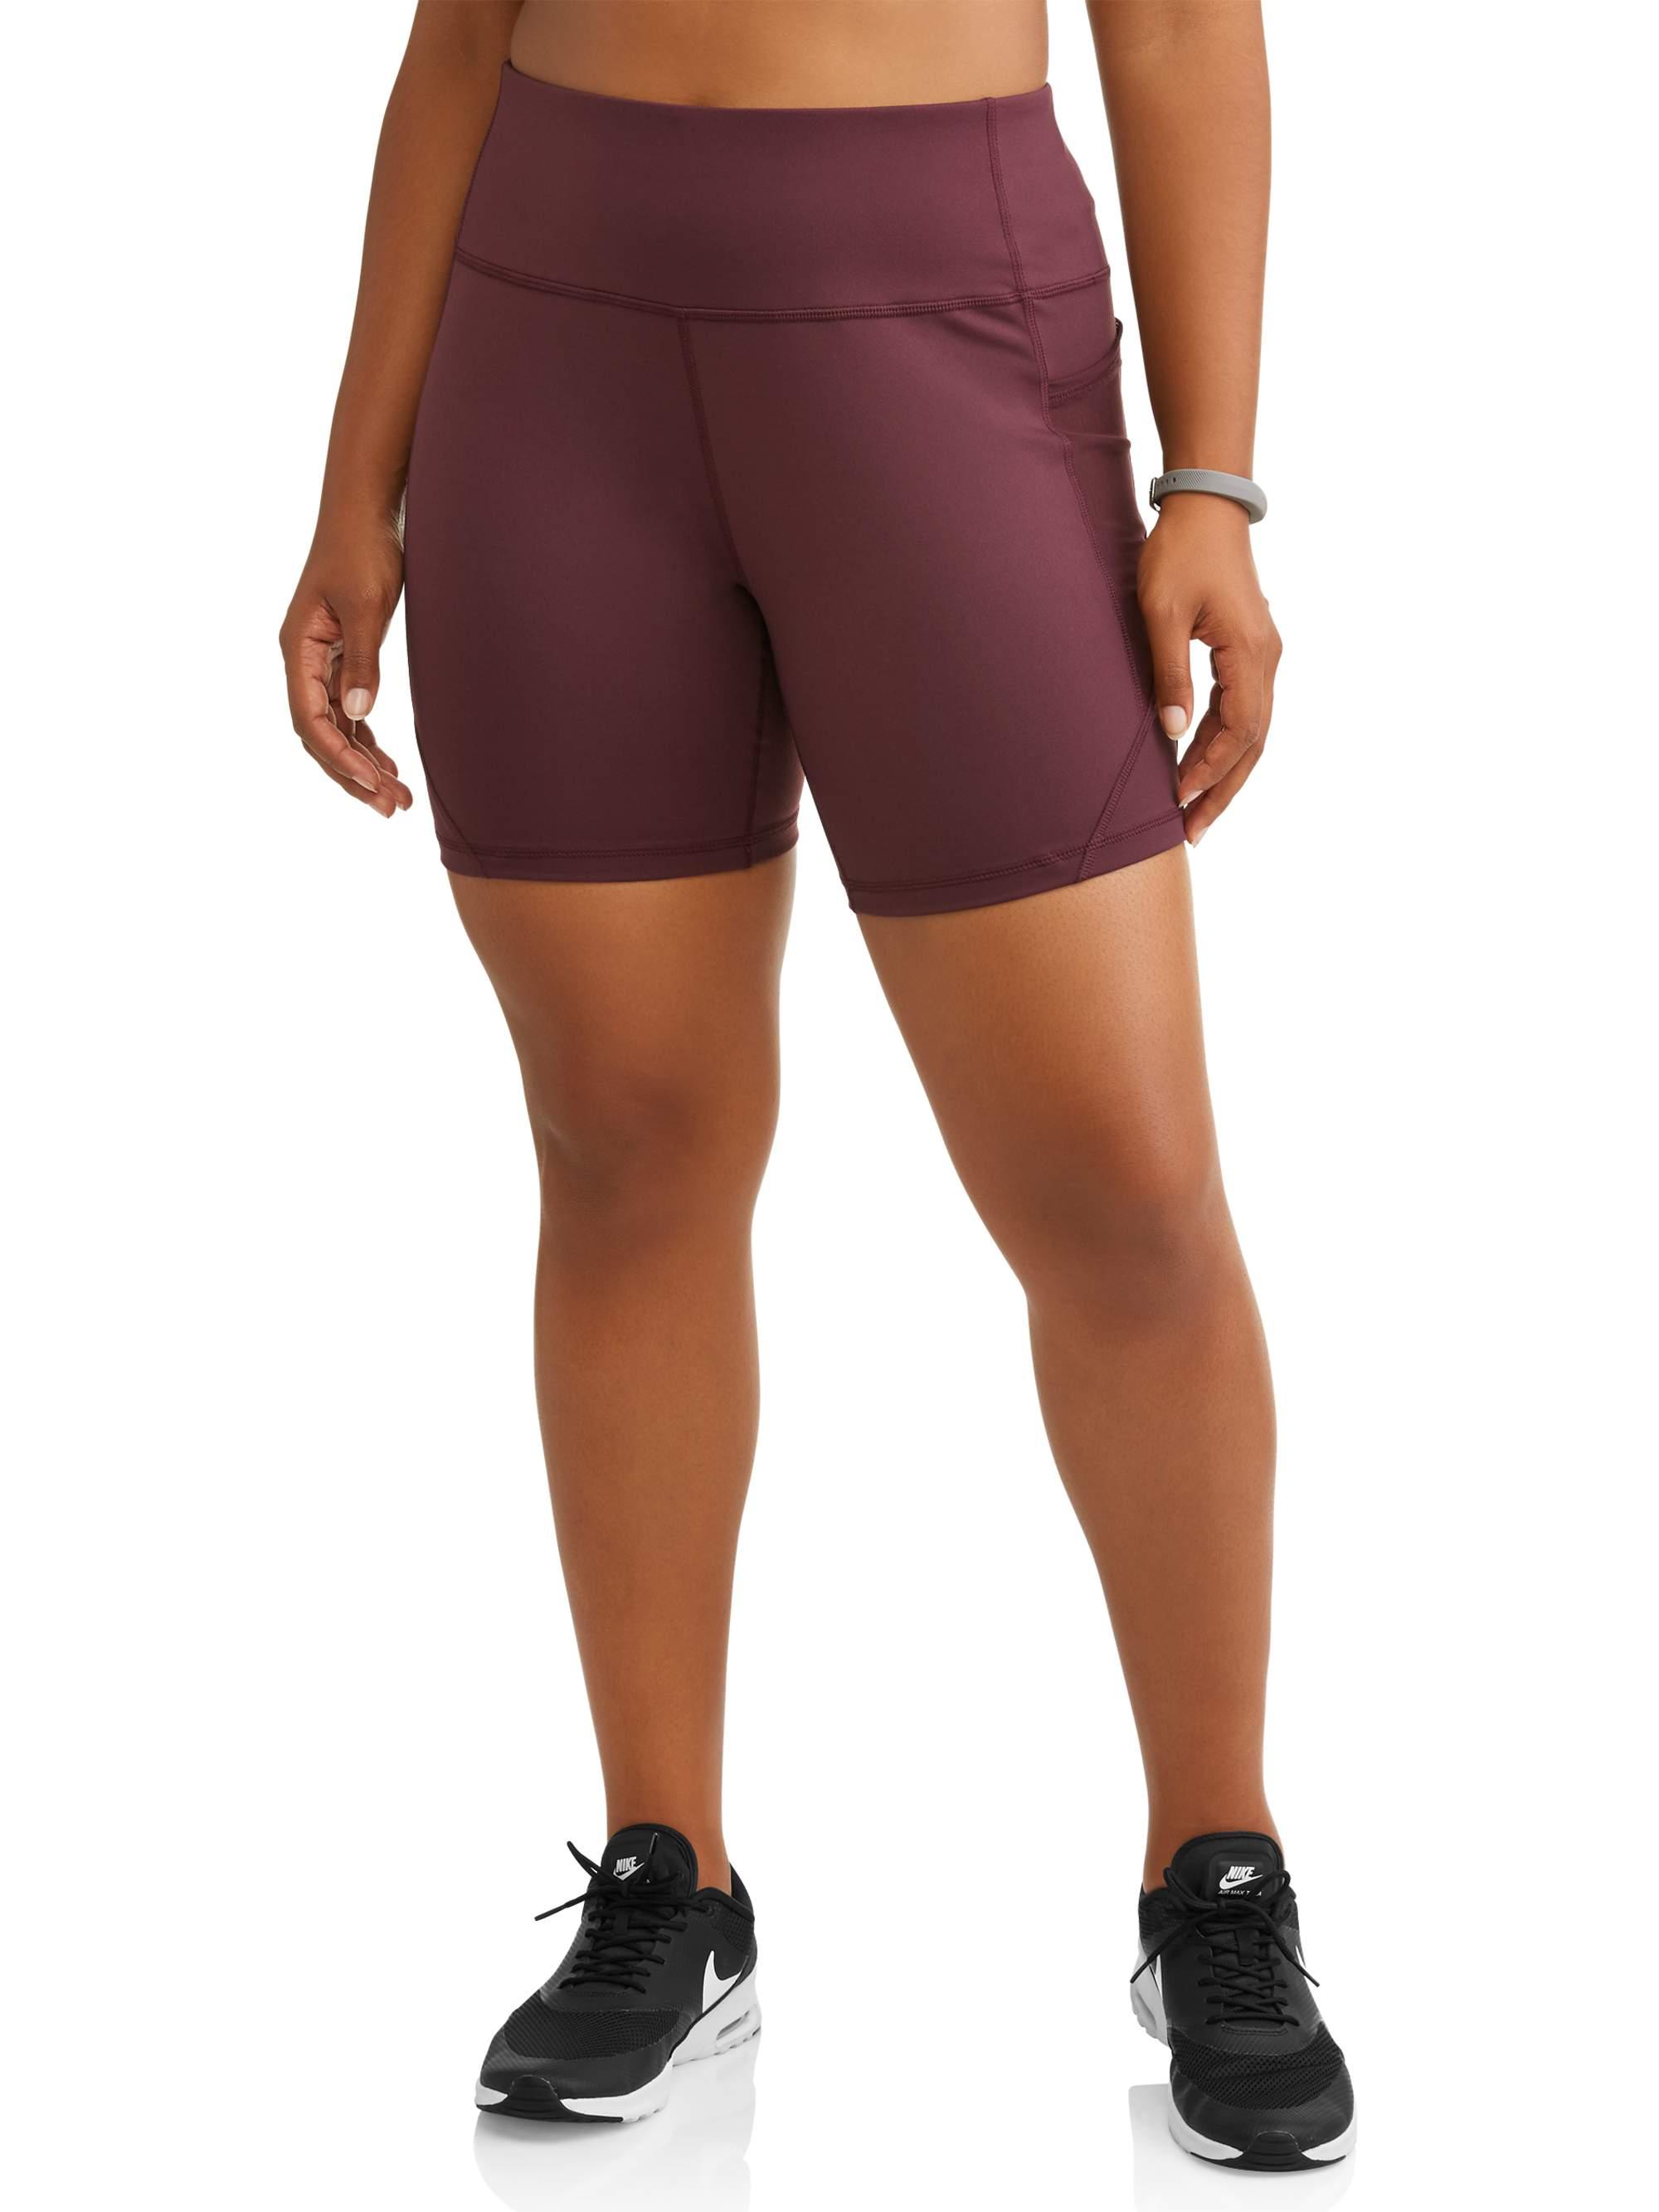 Women's Plus Active Circuit Shorts 7 inch inseam